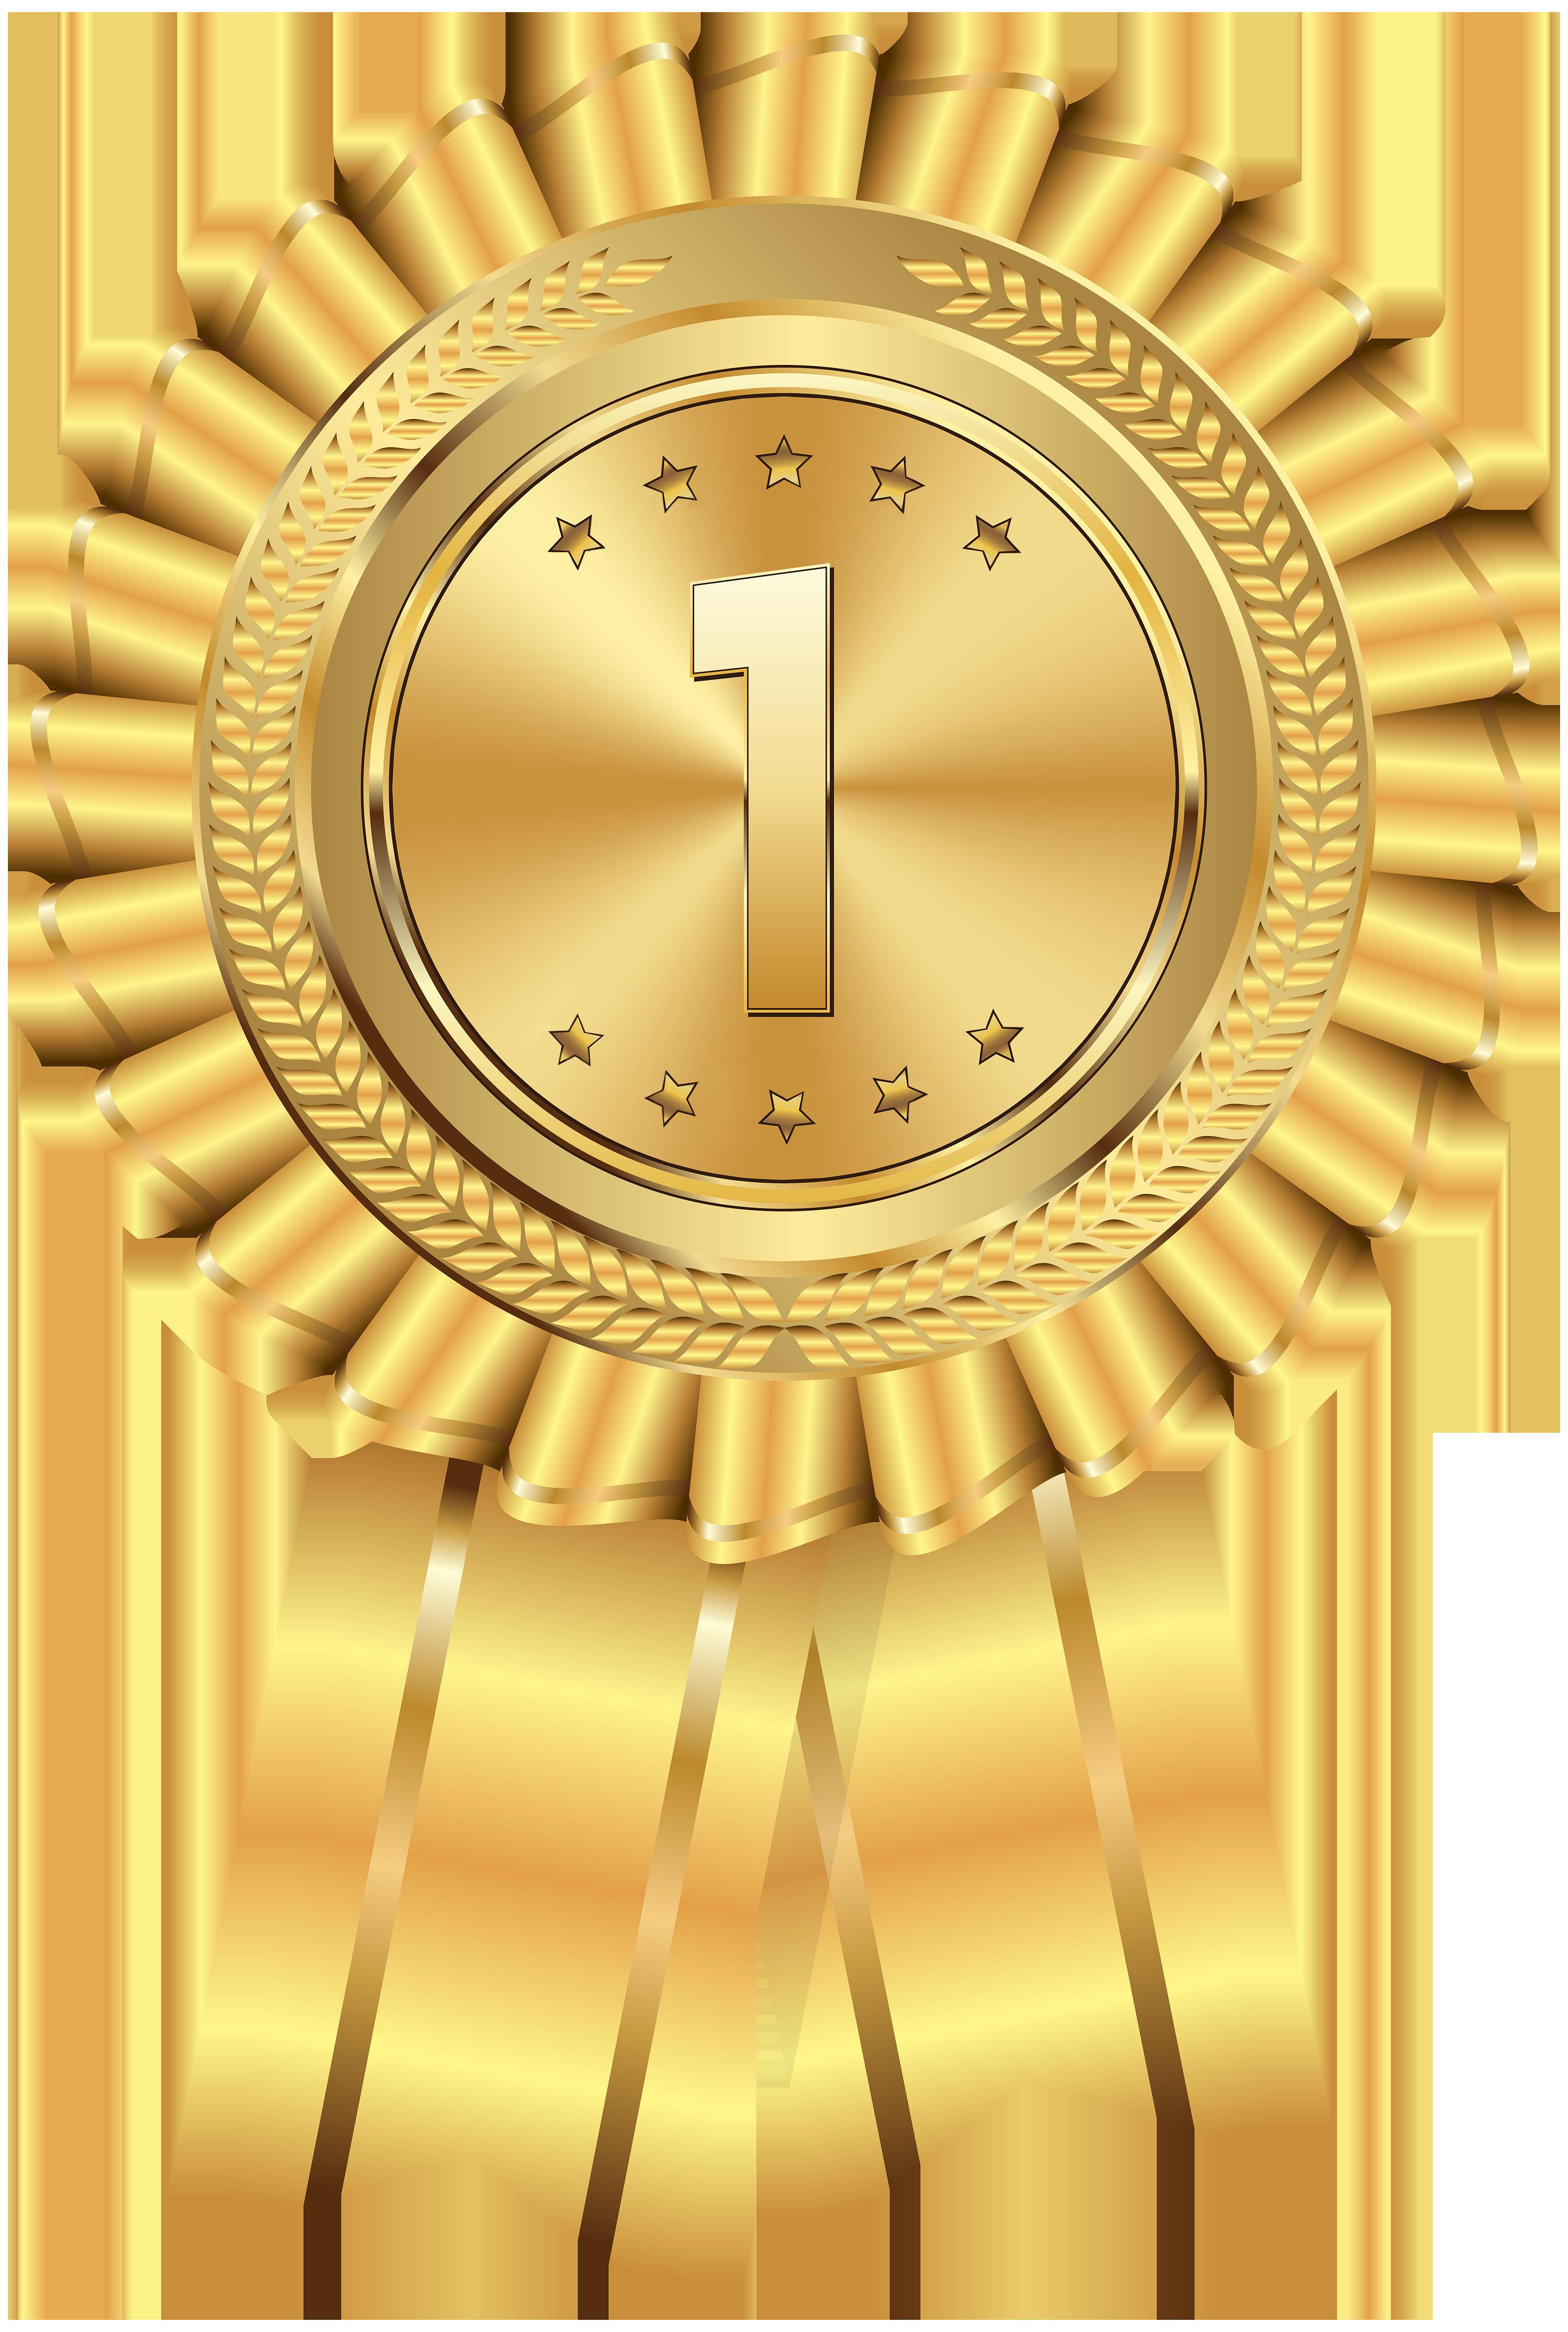 Gold Medal Transparent Png Clip Art Image Gallery Yopriceville High Quality Images And Transparent Png Free Clipart Desain Bingkai Lencana Bingkai